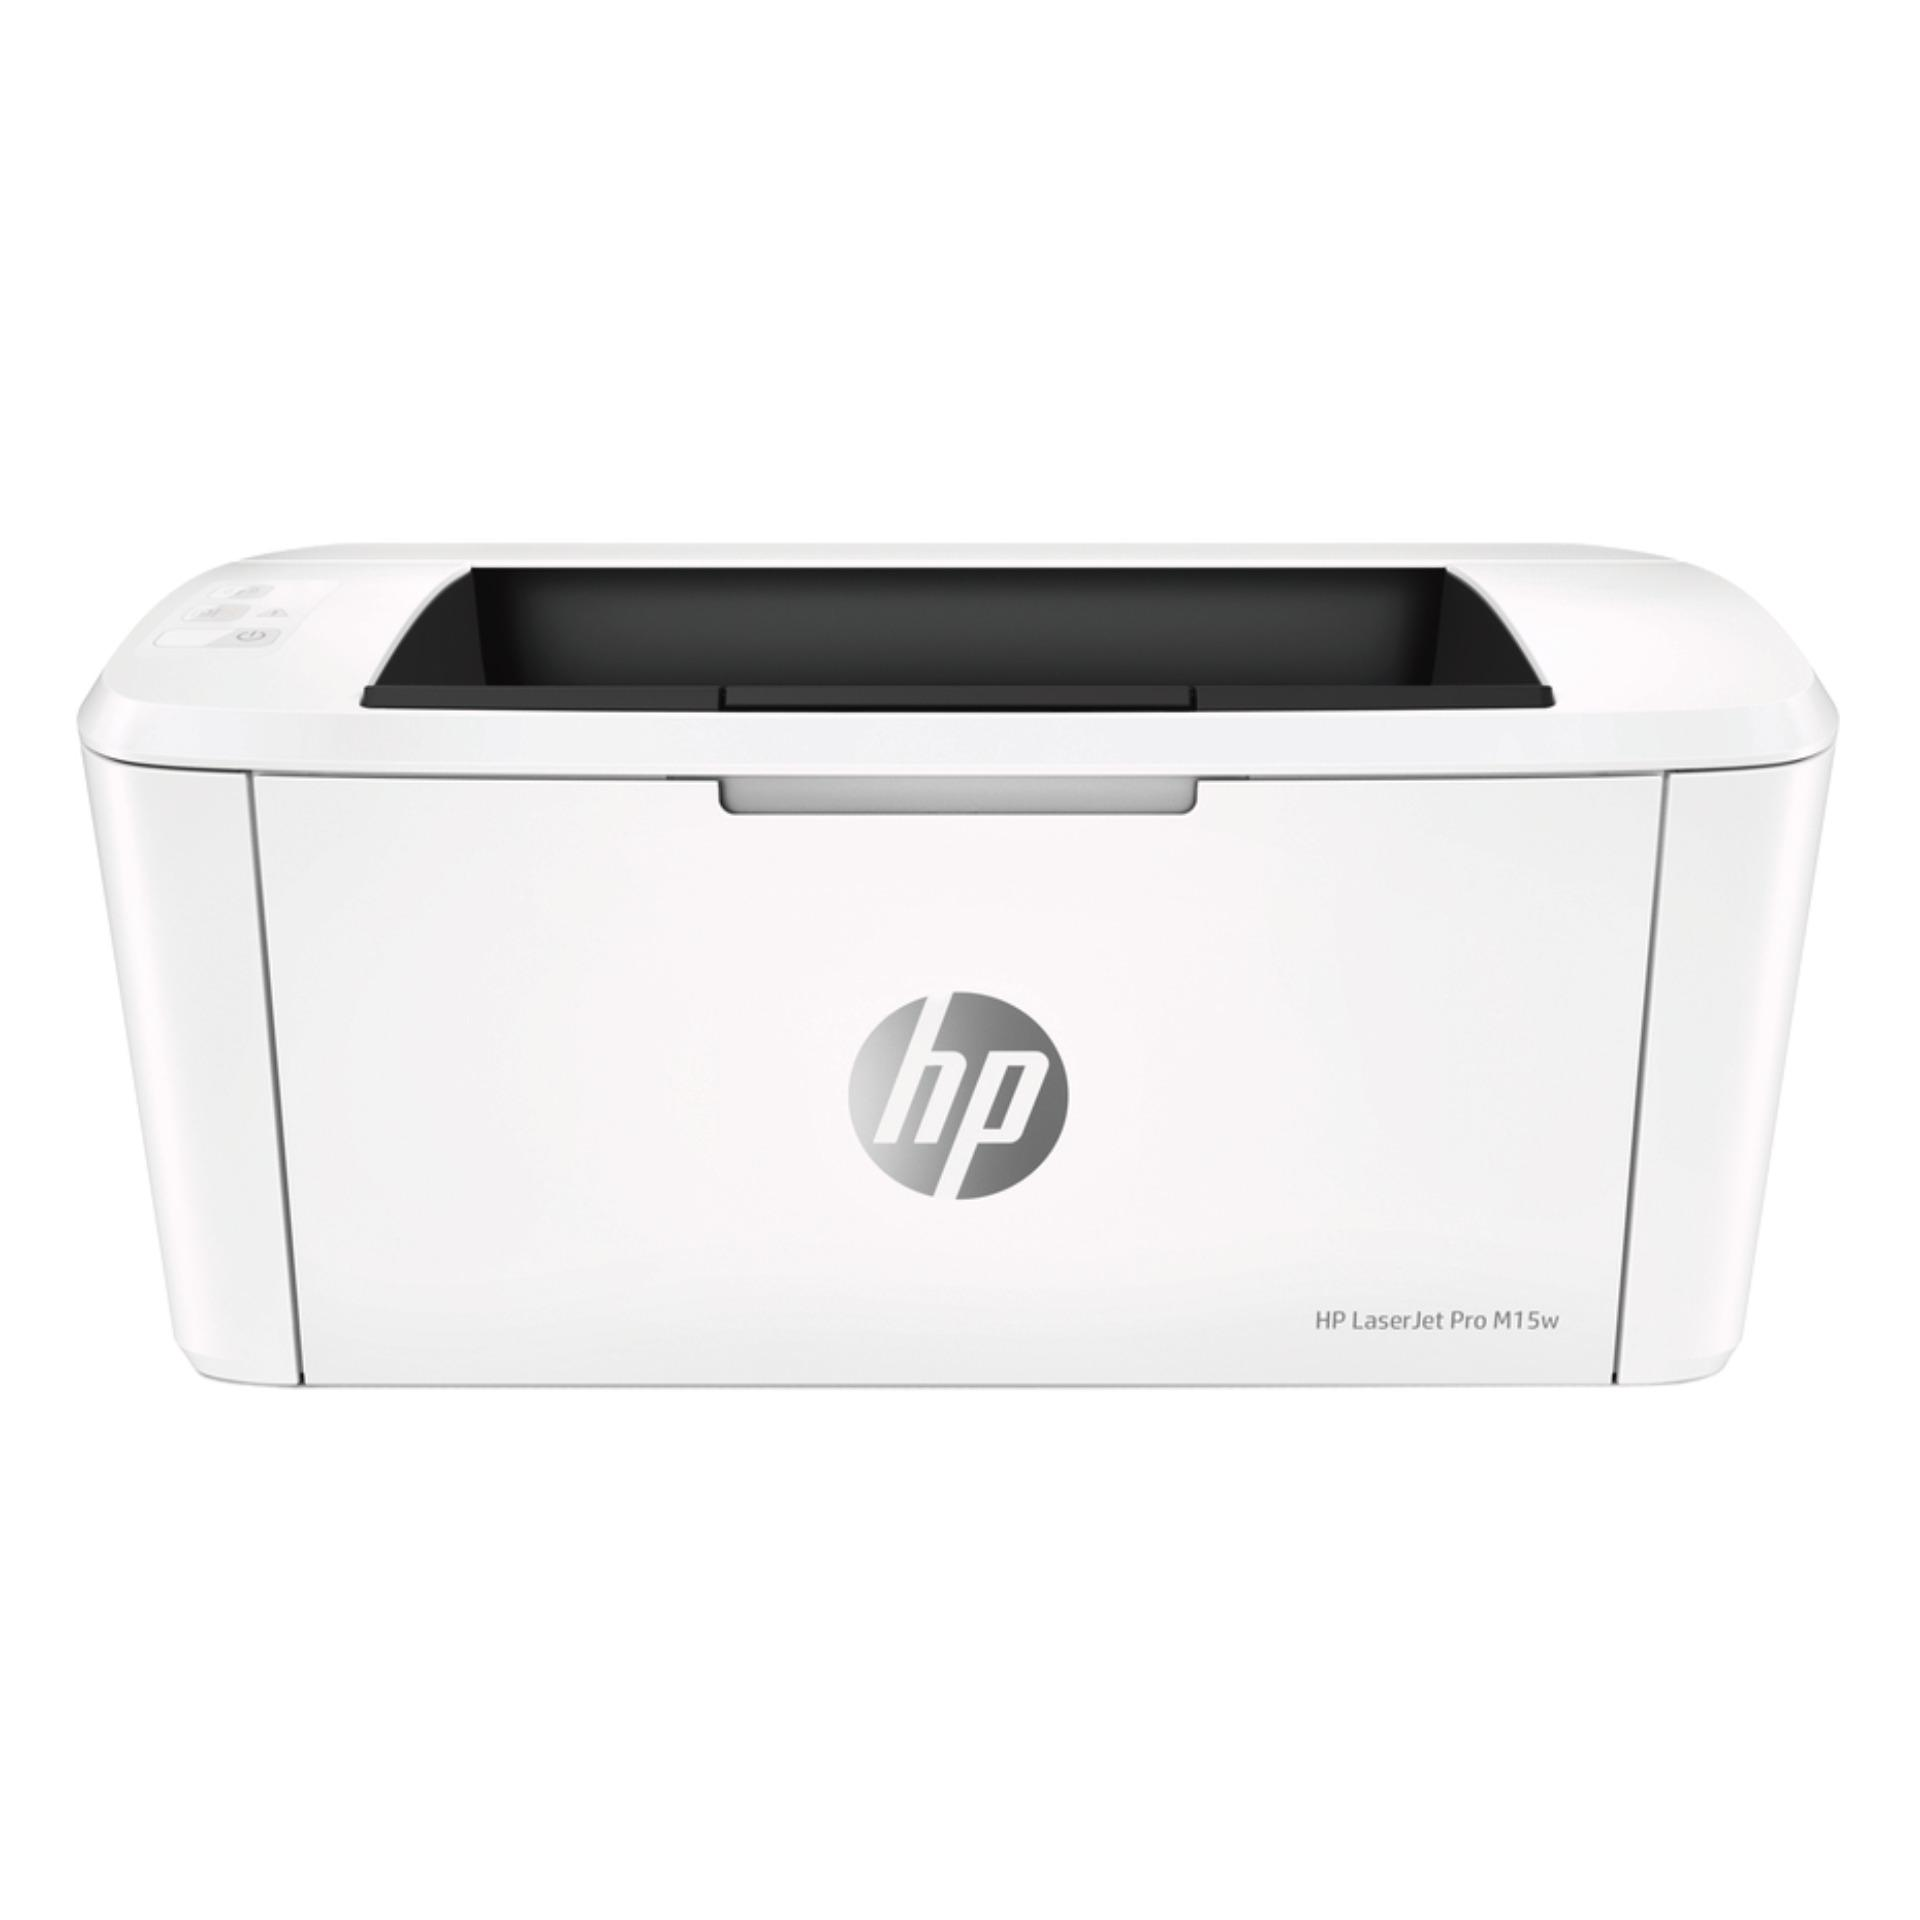 Laserjet Printers For Sale All In One Prices Brands Fuji Xerox Docuprint Cp115w Hp Pro M15w Print Wireless